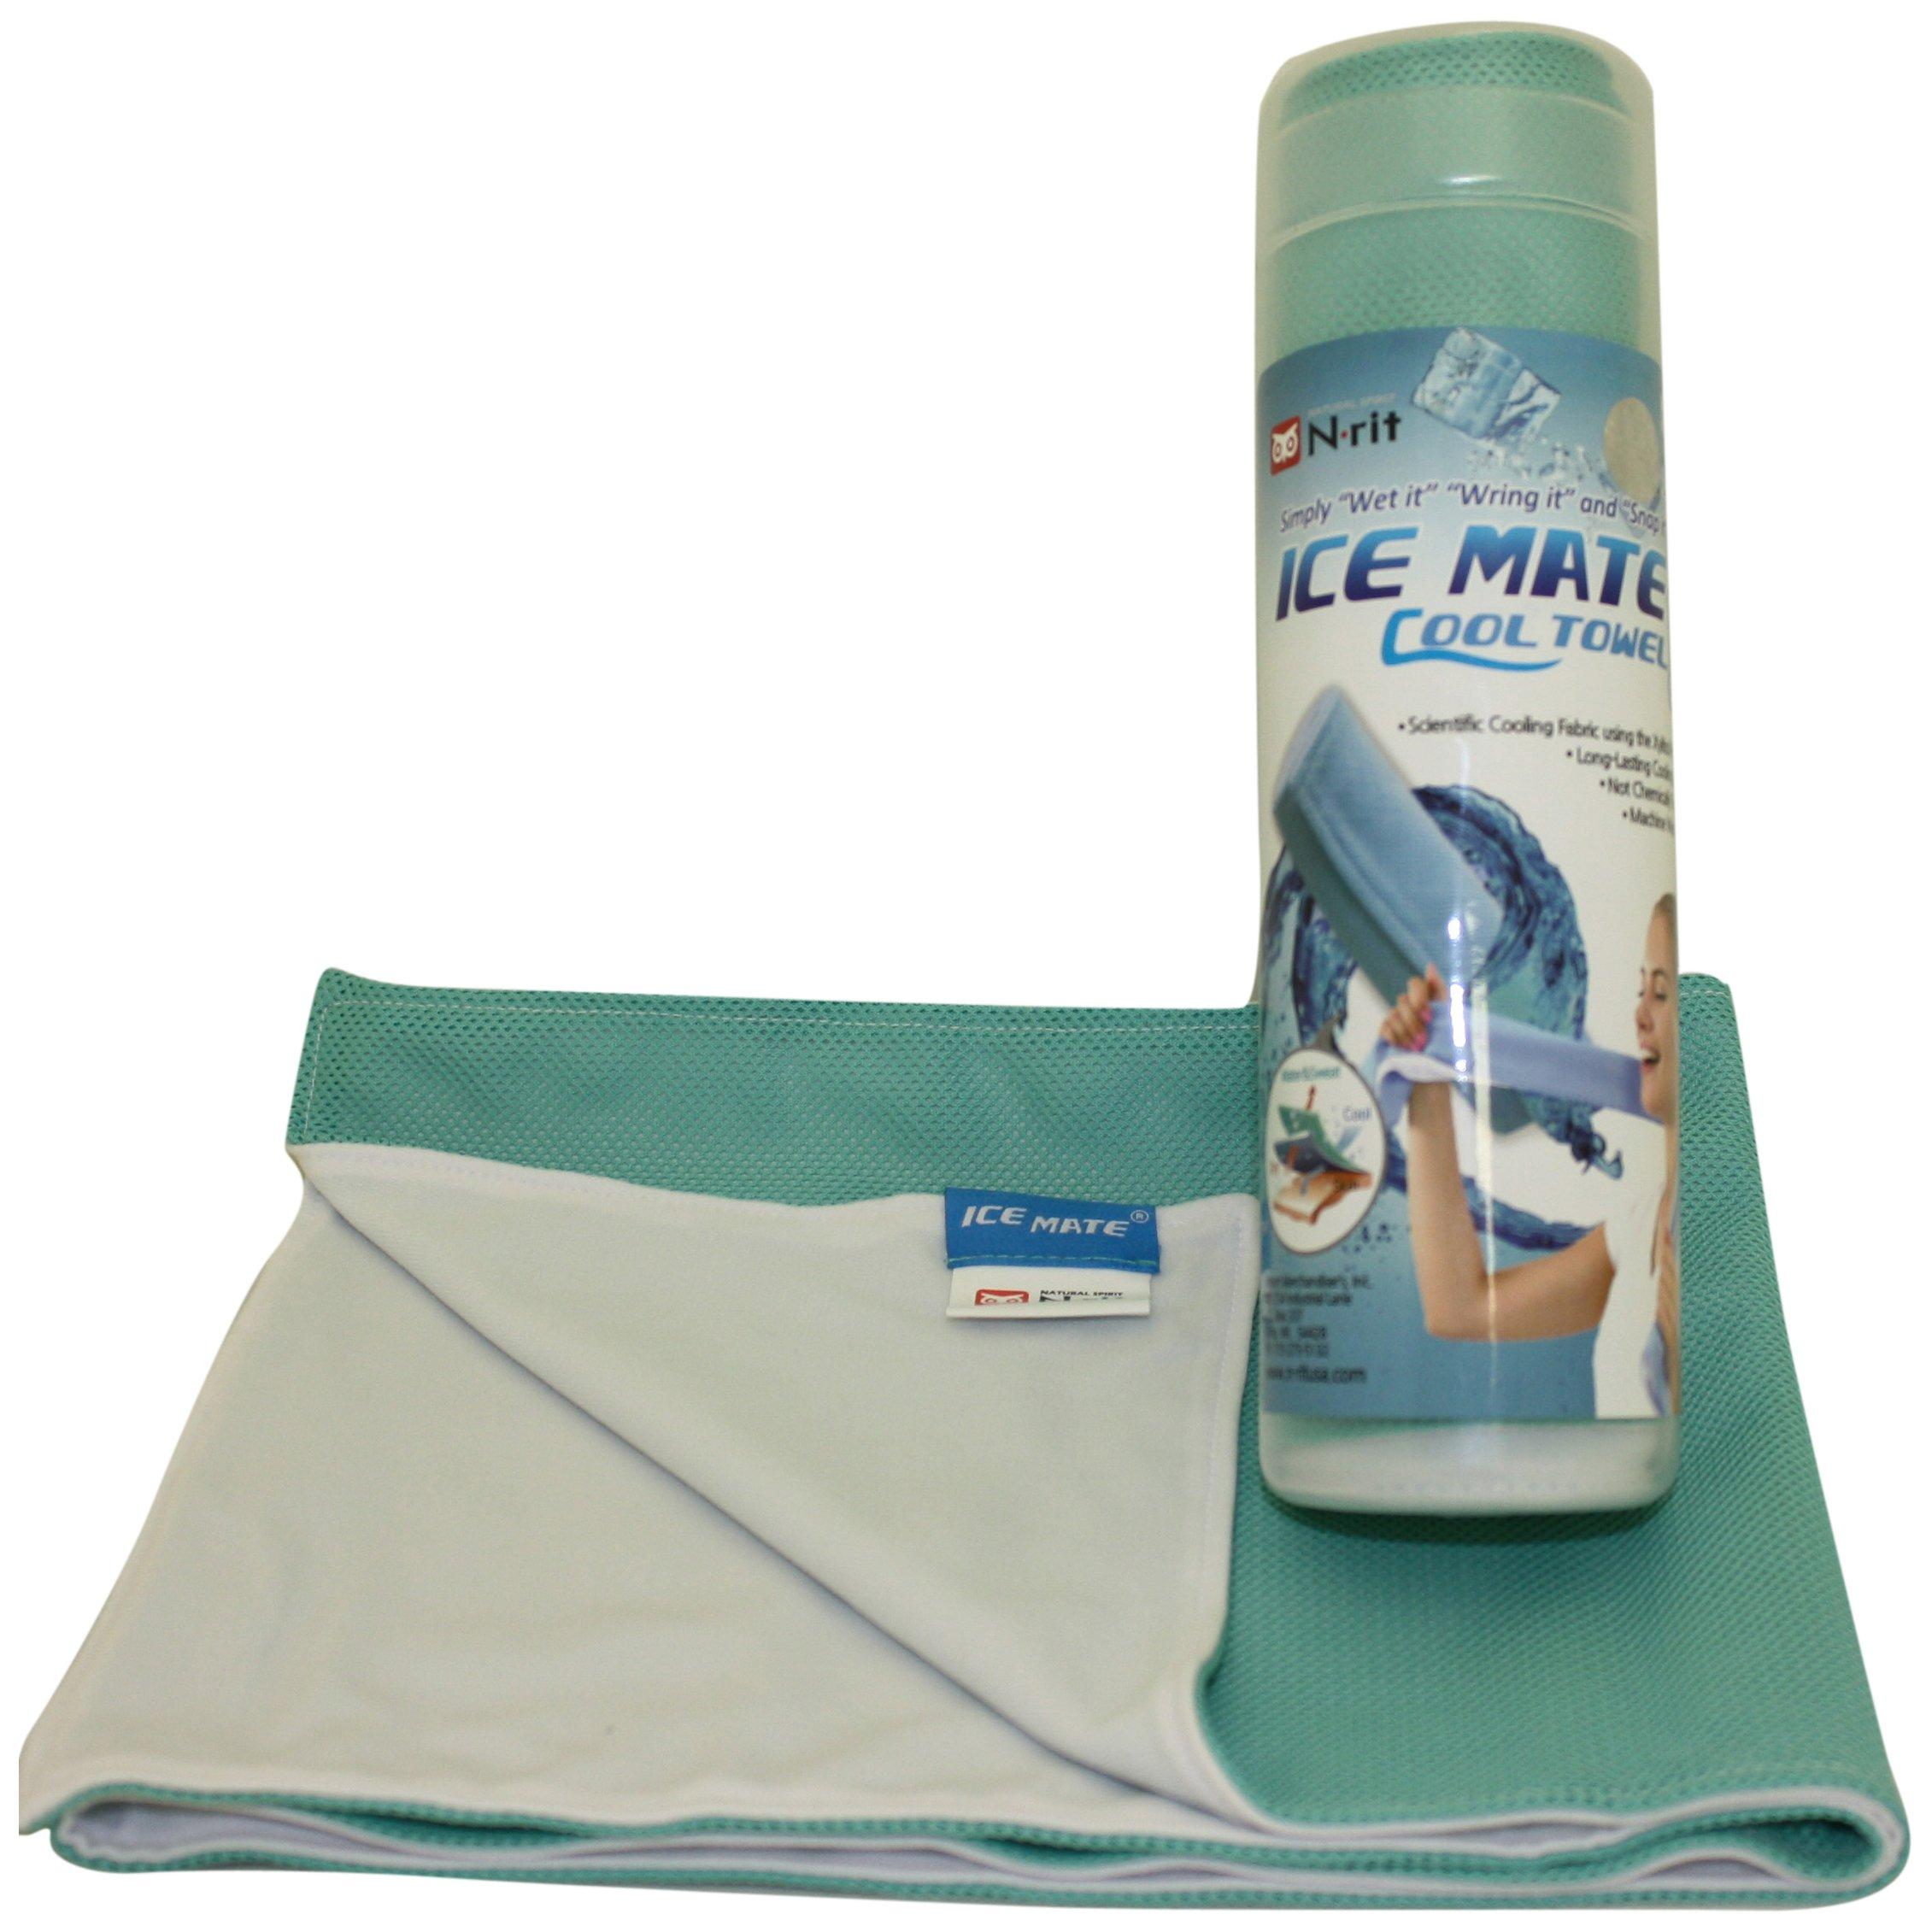 N-Rit Ice Mate Cool Towel Emerald Green & White